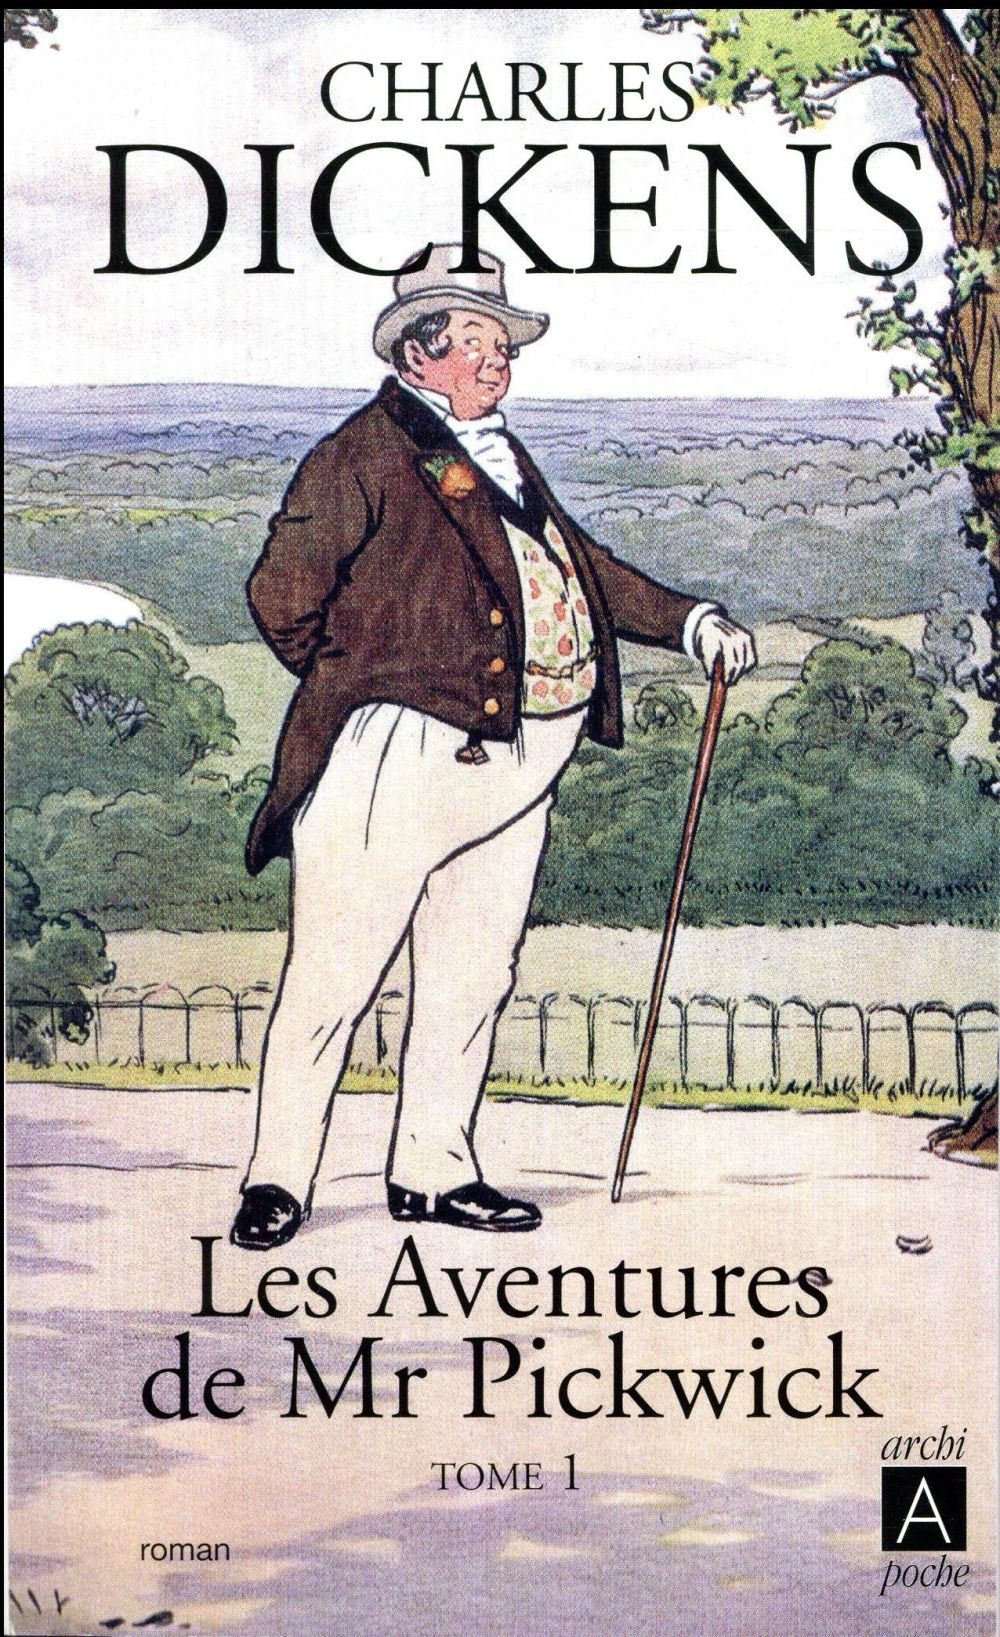 Les aventures de Mr Pickwick